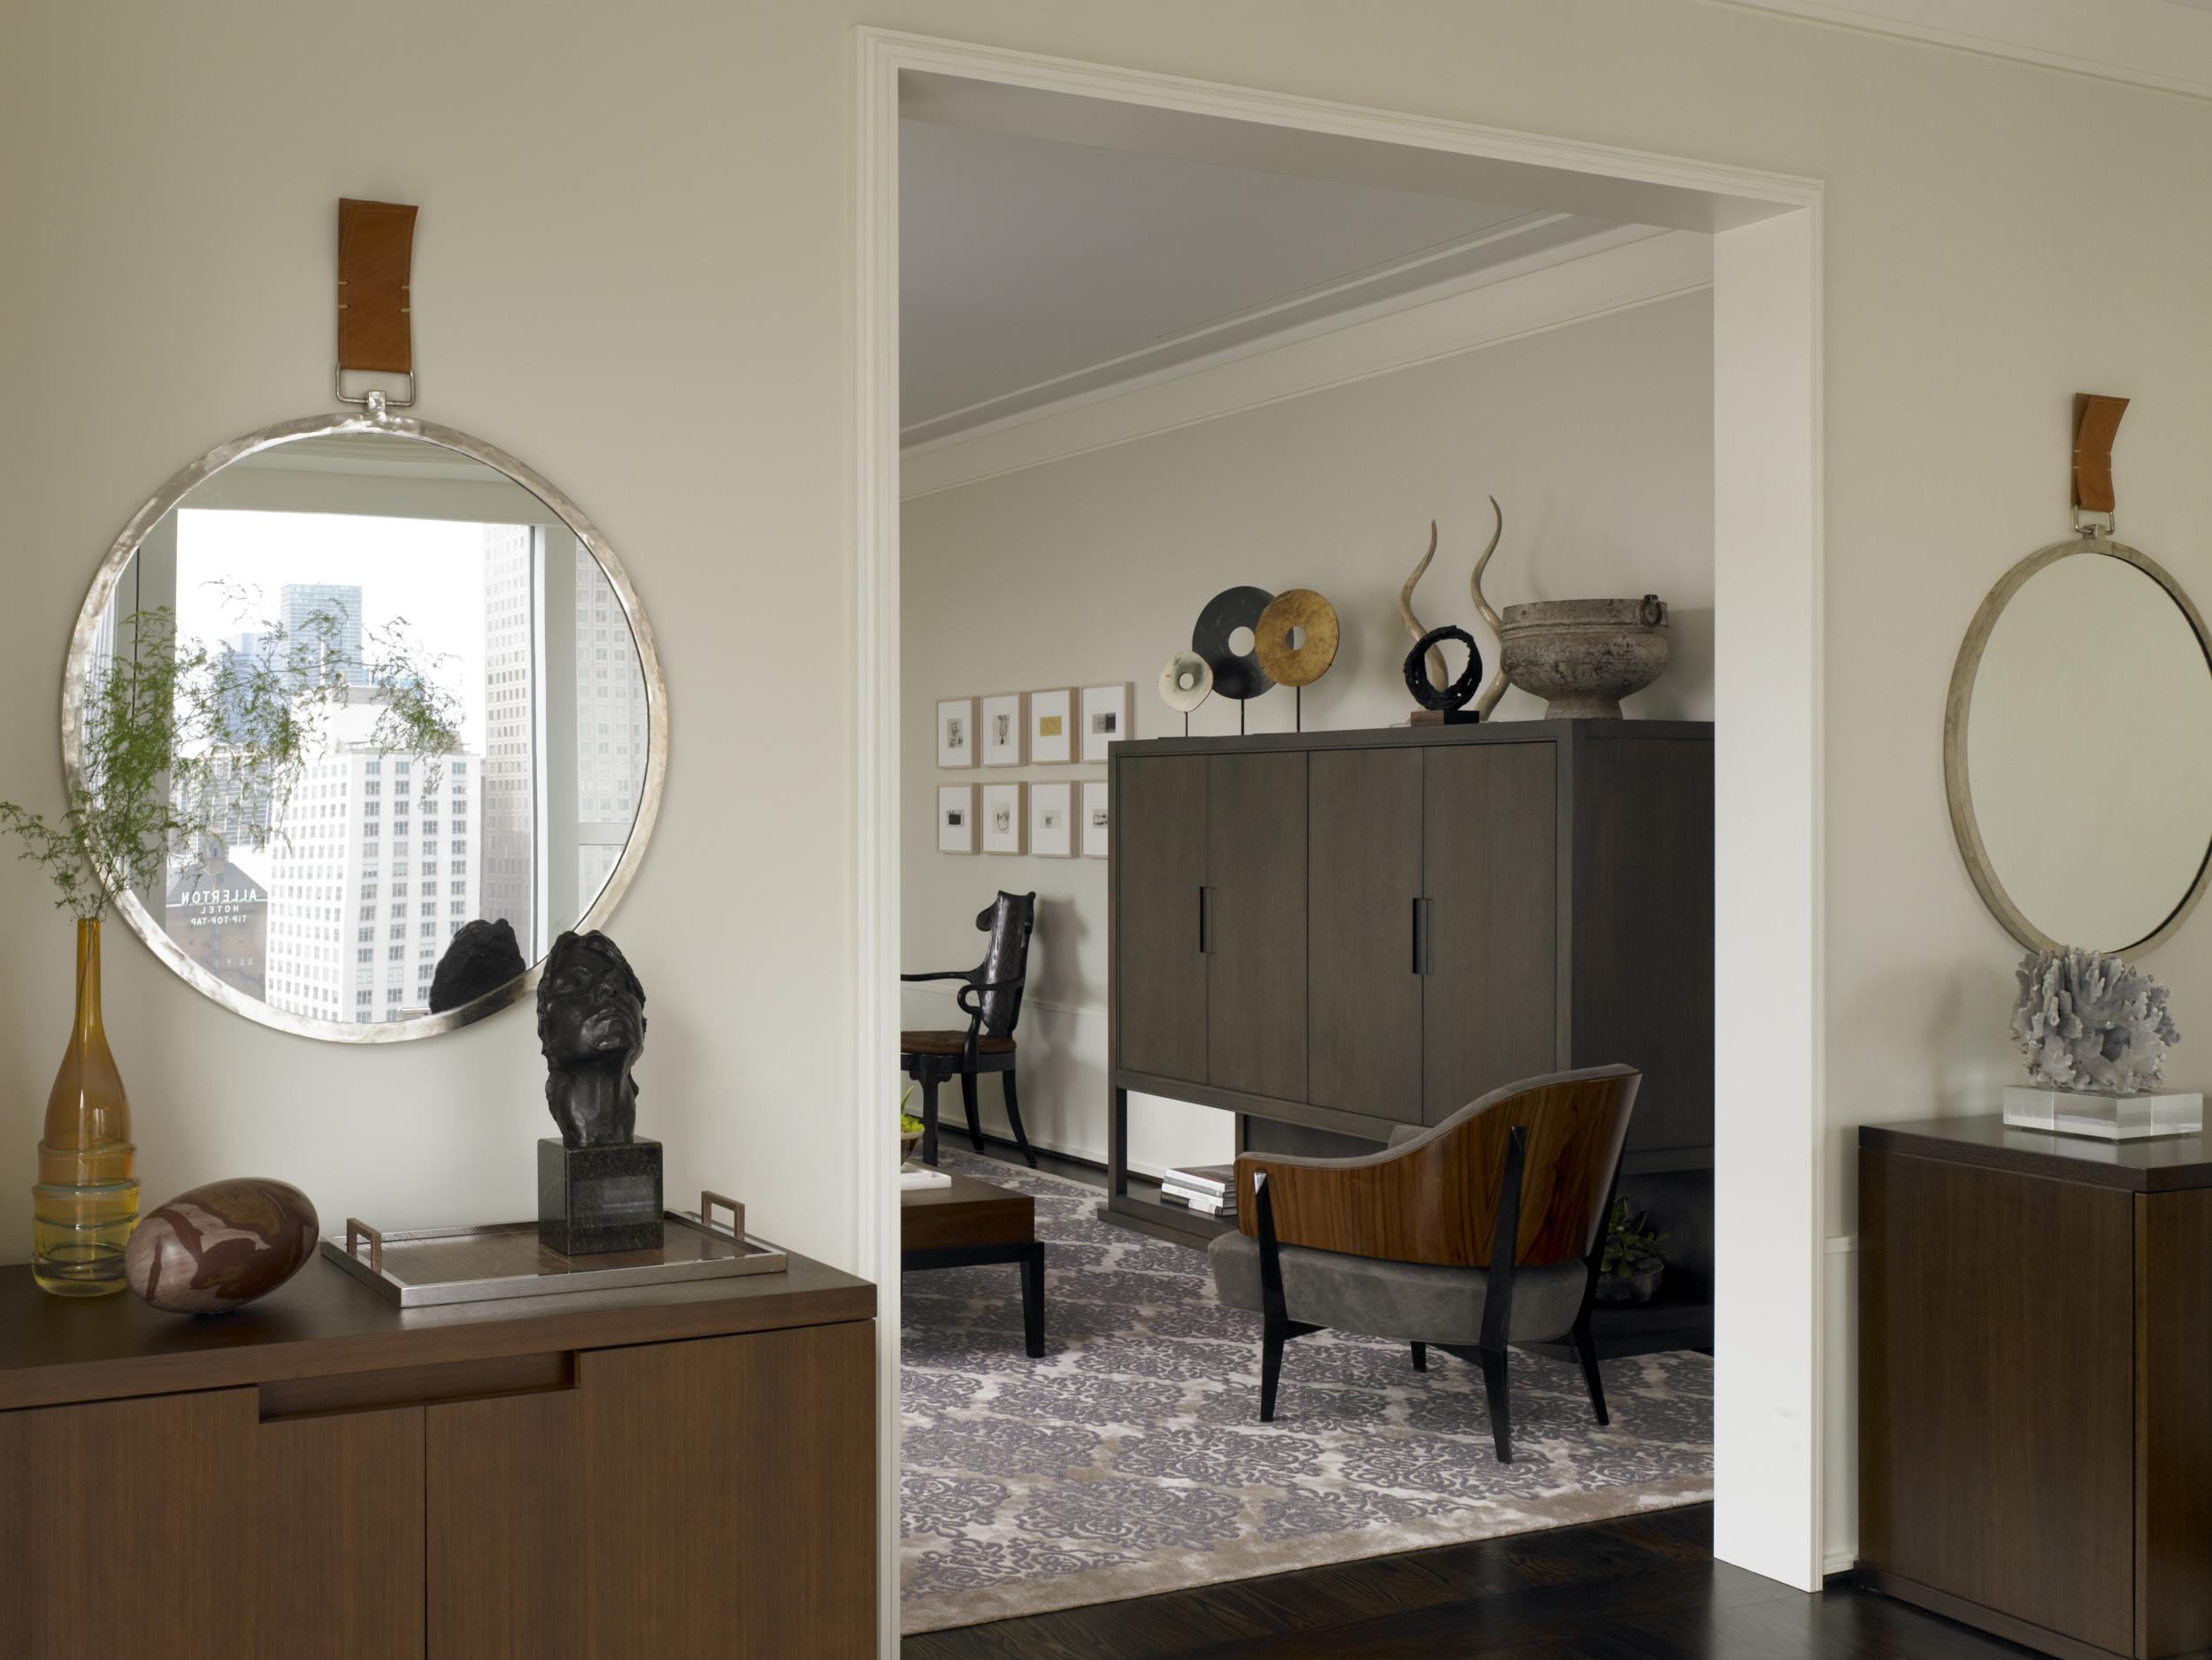 Kadlec Architecture + Design - Michigan Avenue Residence 3.jpg